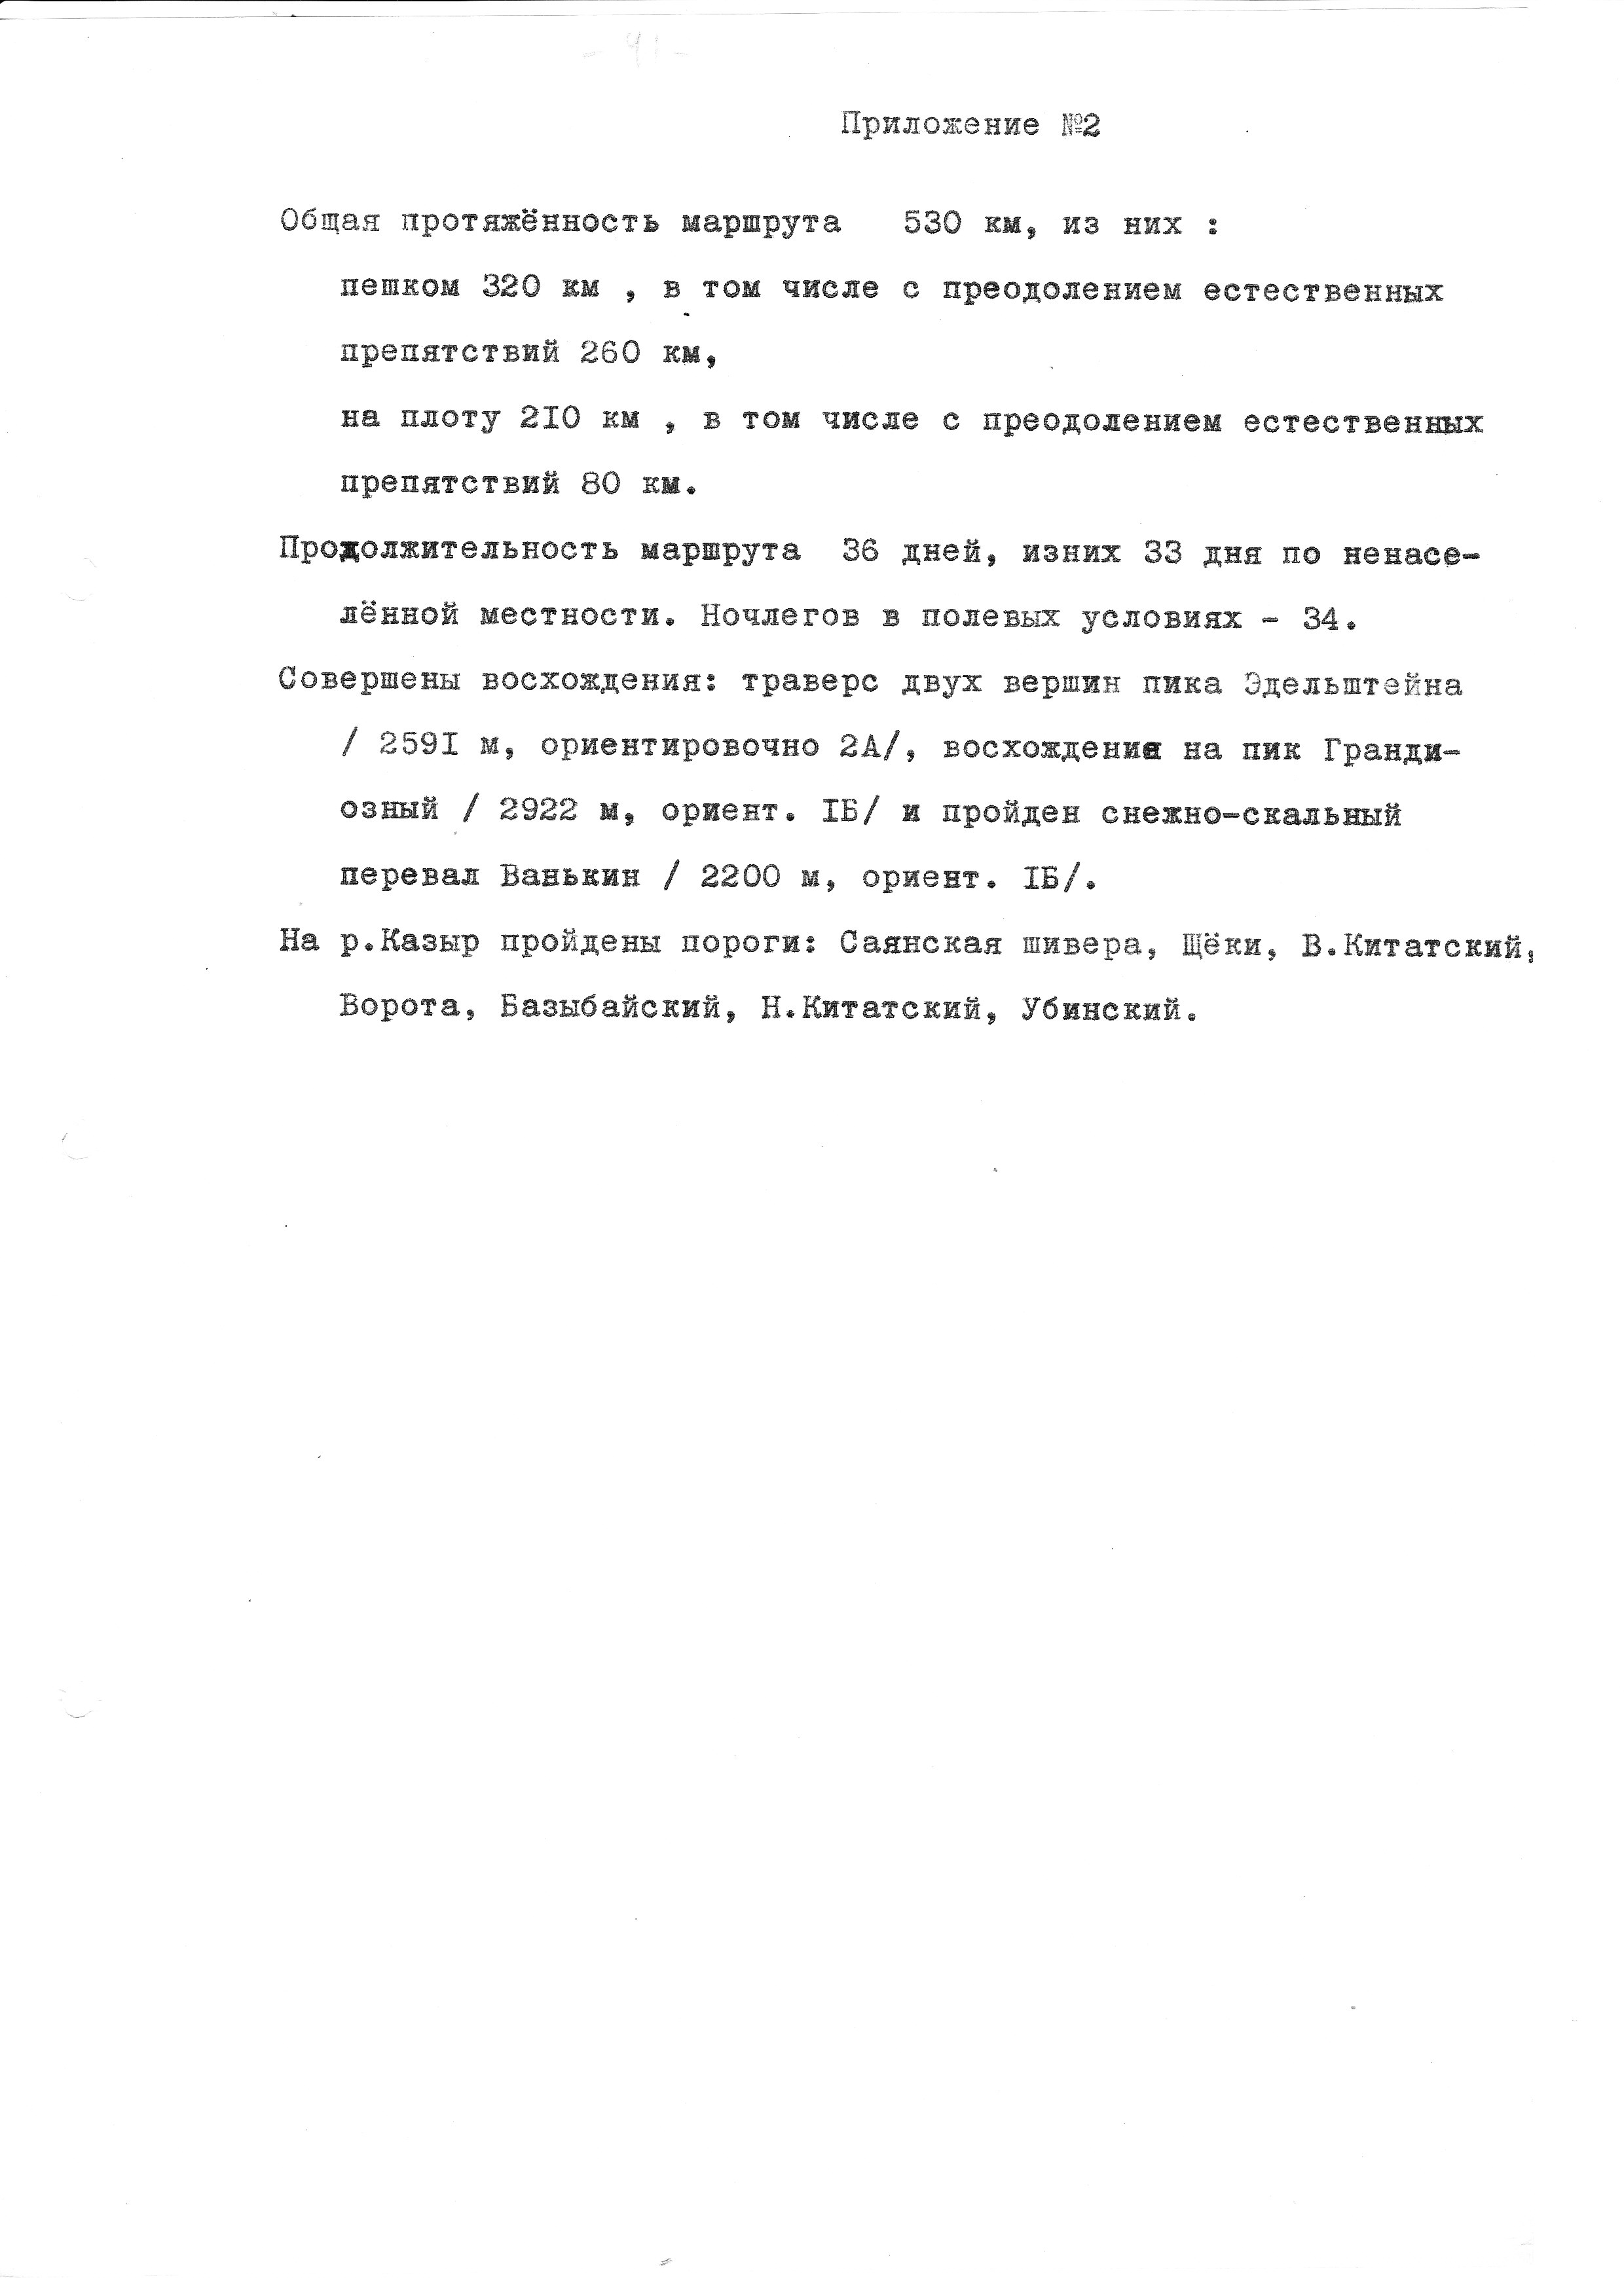 https://img-fotki.yandex.ru/get/2814/164520479.7e/0_e48d8_b31bd958_orig.jpg